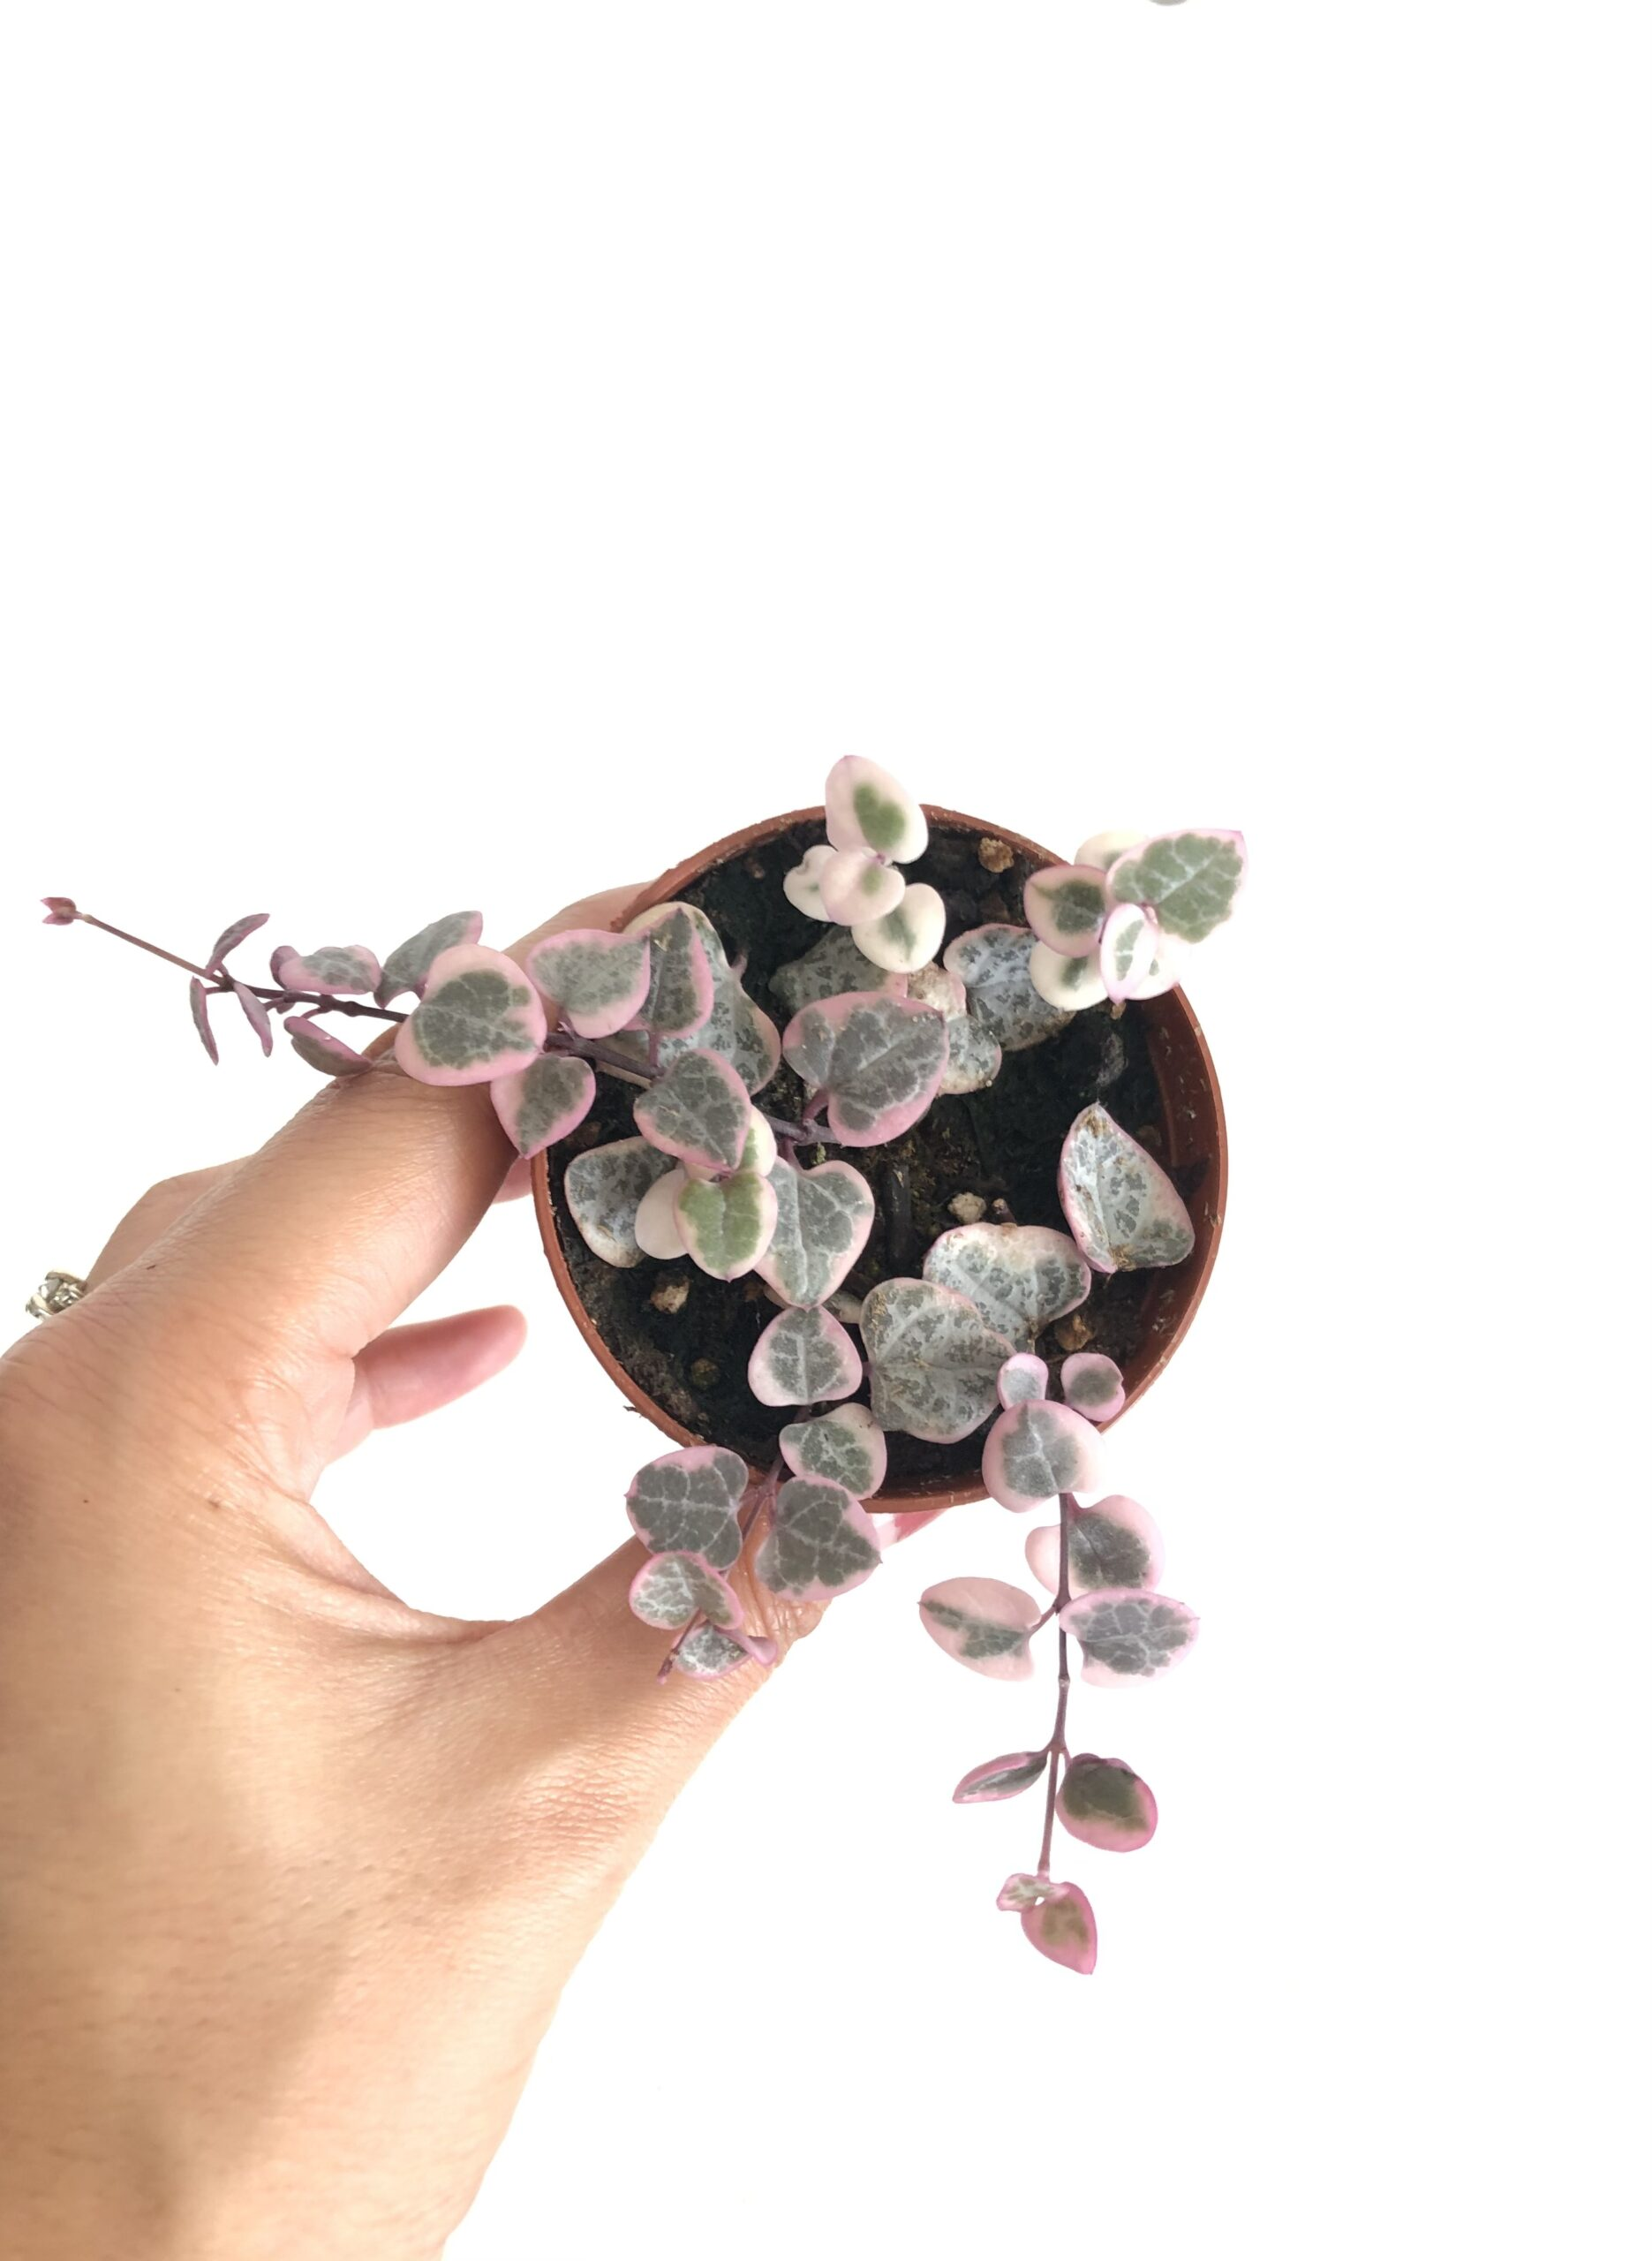 variegated plants